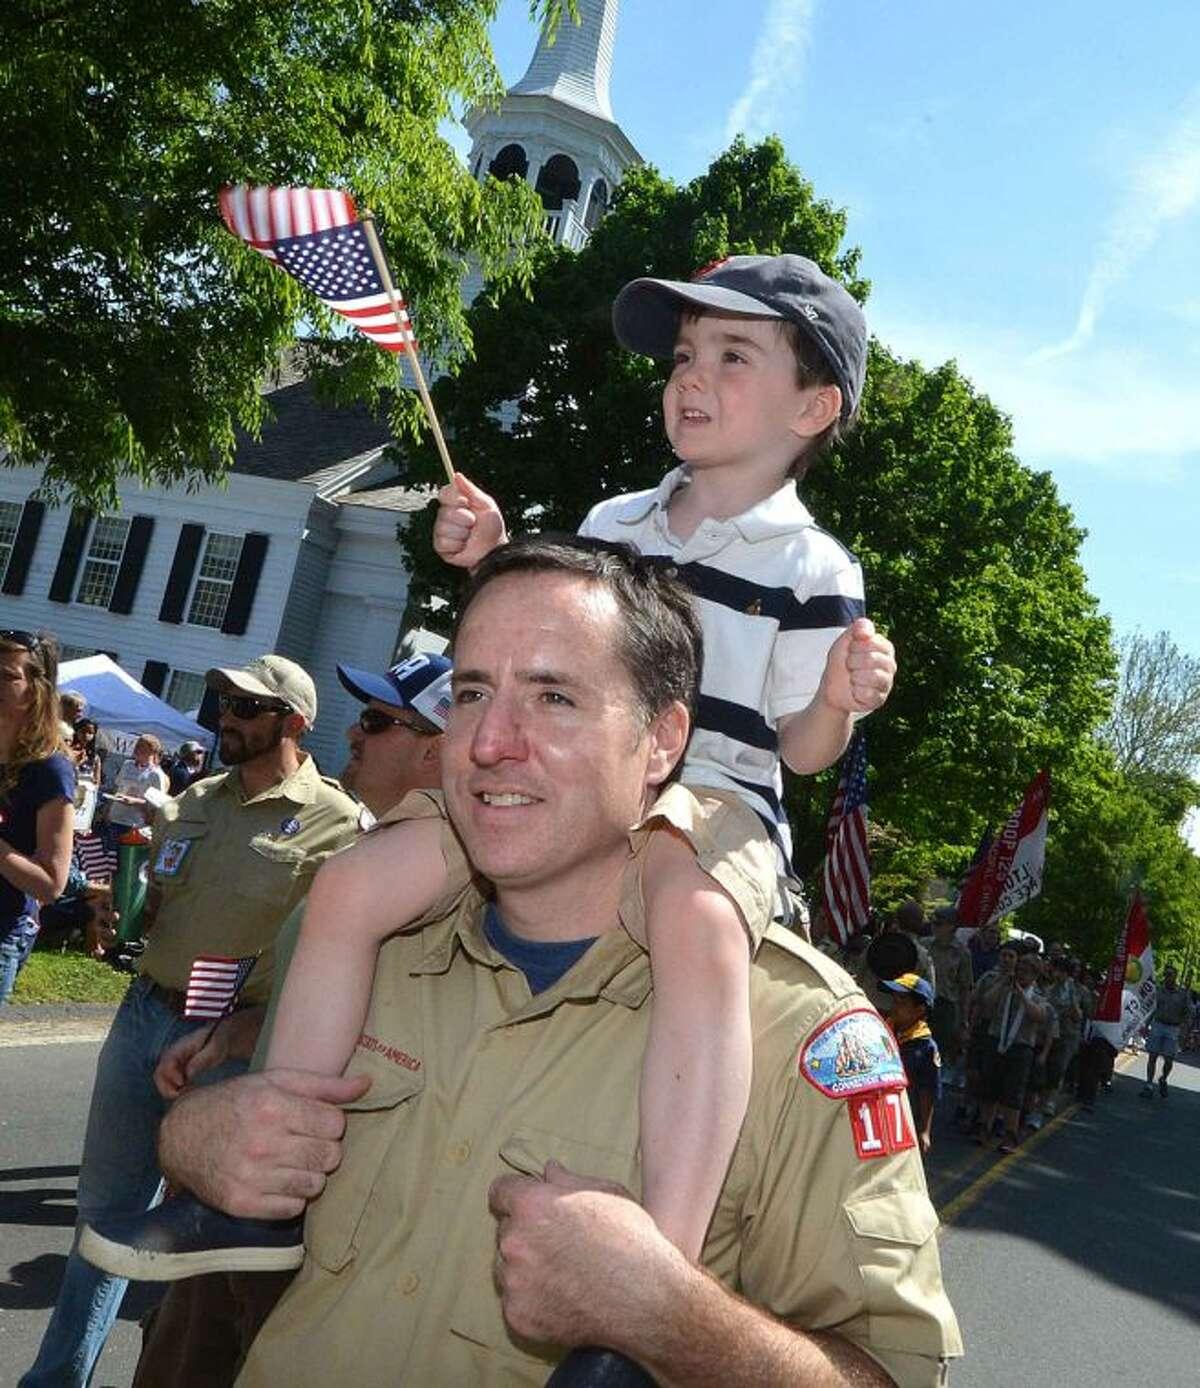 Hour Photo/Alex von Kleydorff Pack 17 Cub Scout 4yr old Gavin Rafferty gets a ride on dad Brian's shoulders the last few feet during Wilton Memorial Day Parade